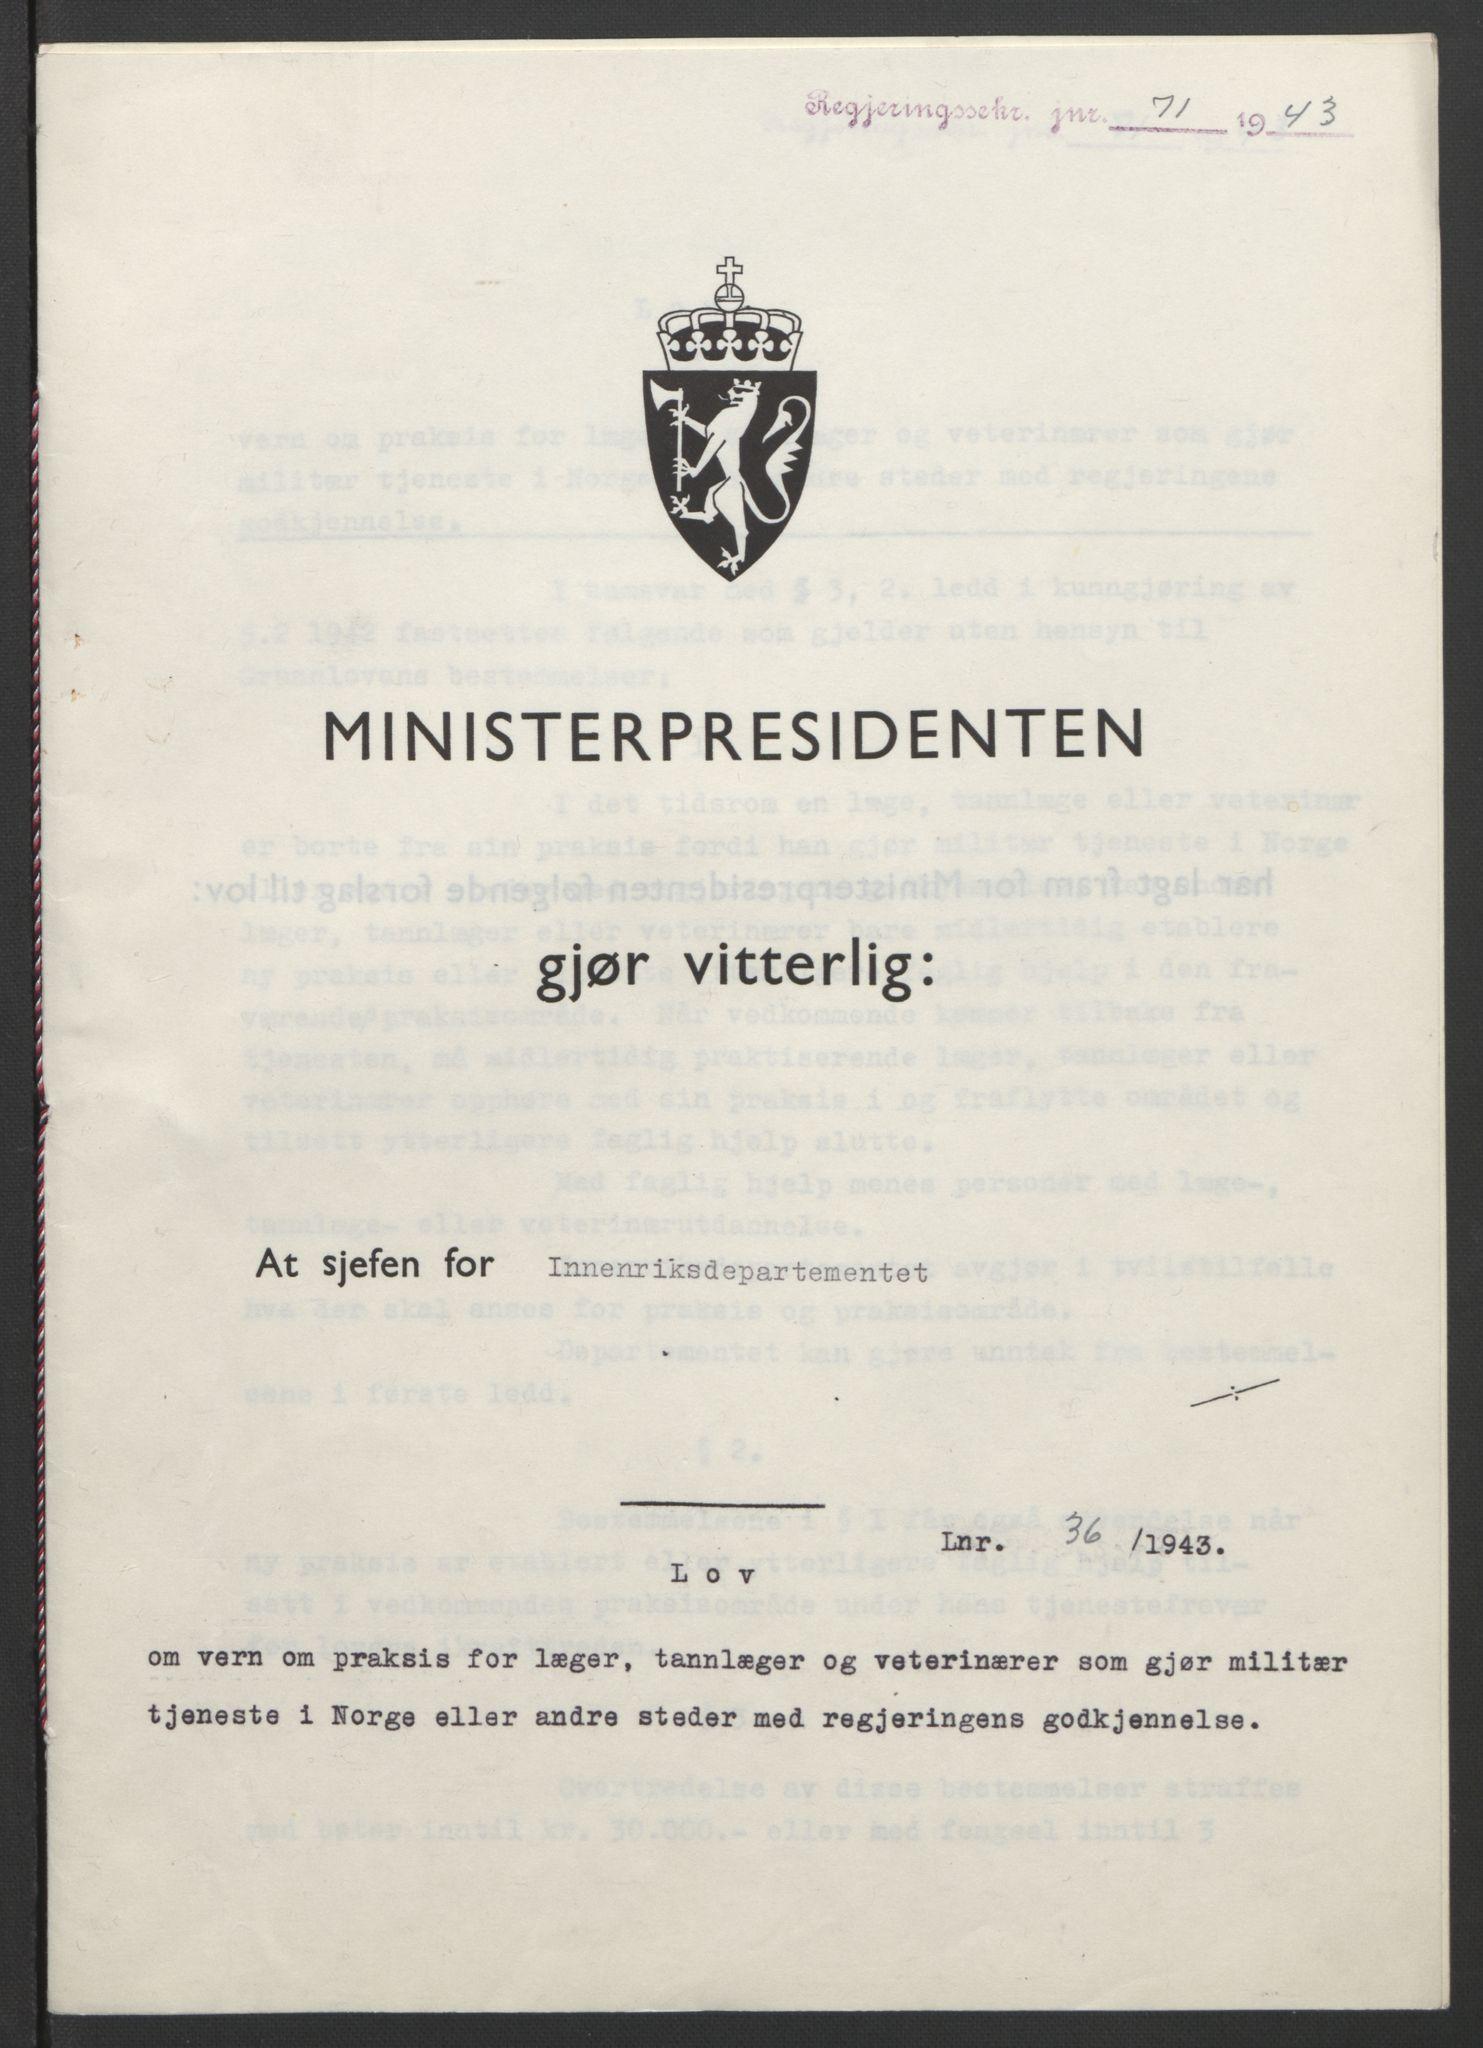 RA, NS-administrasjonen 1940-1945 (Statsrådsekretariatet, de kommisariske statsråder mm), D/Db/L0099: Lover, 1943, s. upaginert